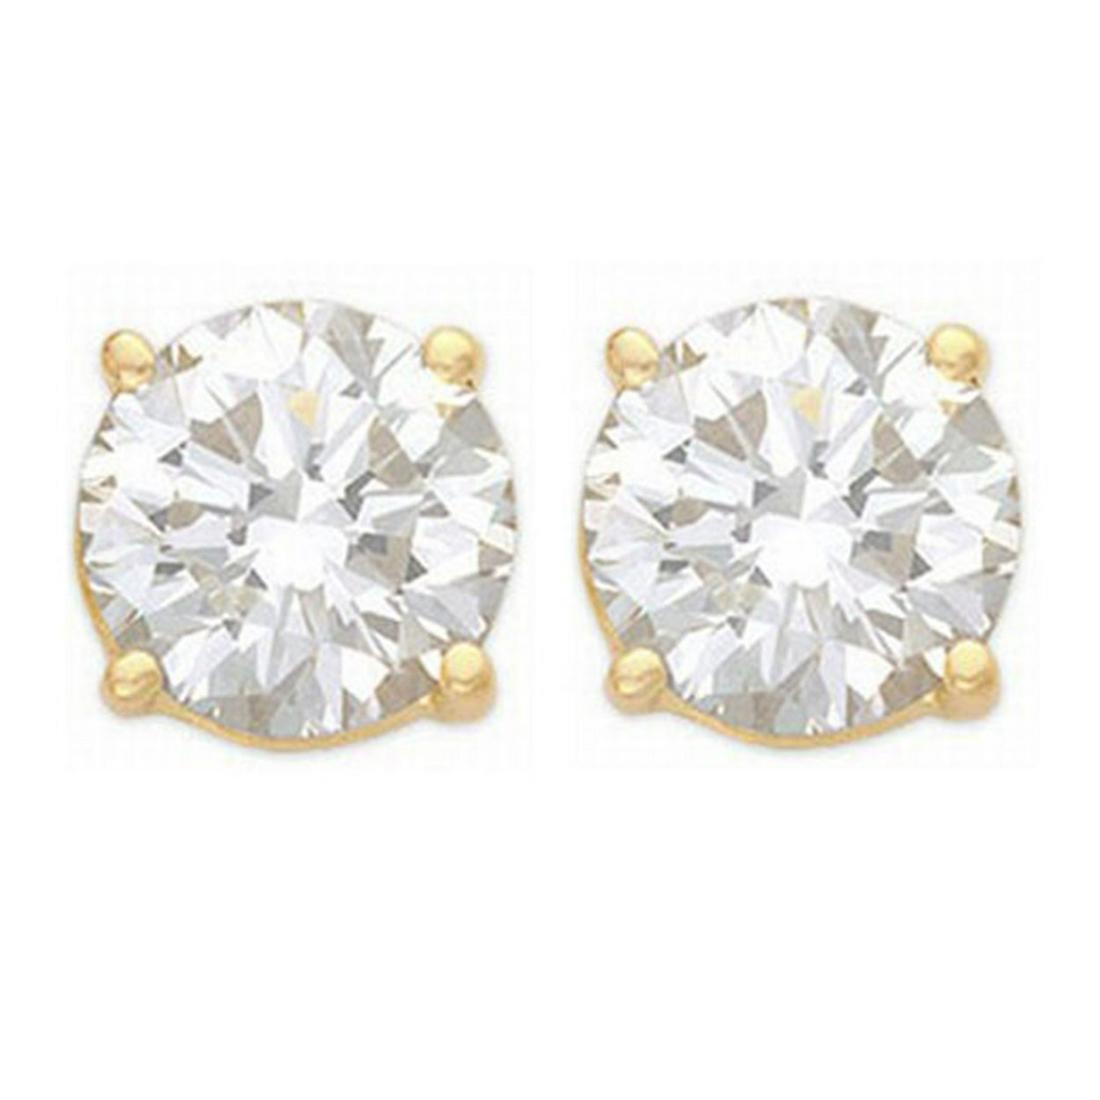 1.50 ctw VS/SI Diamond Stud Earrings 14K Yellow Gold -